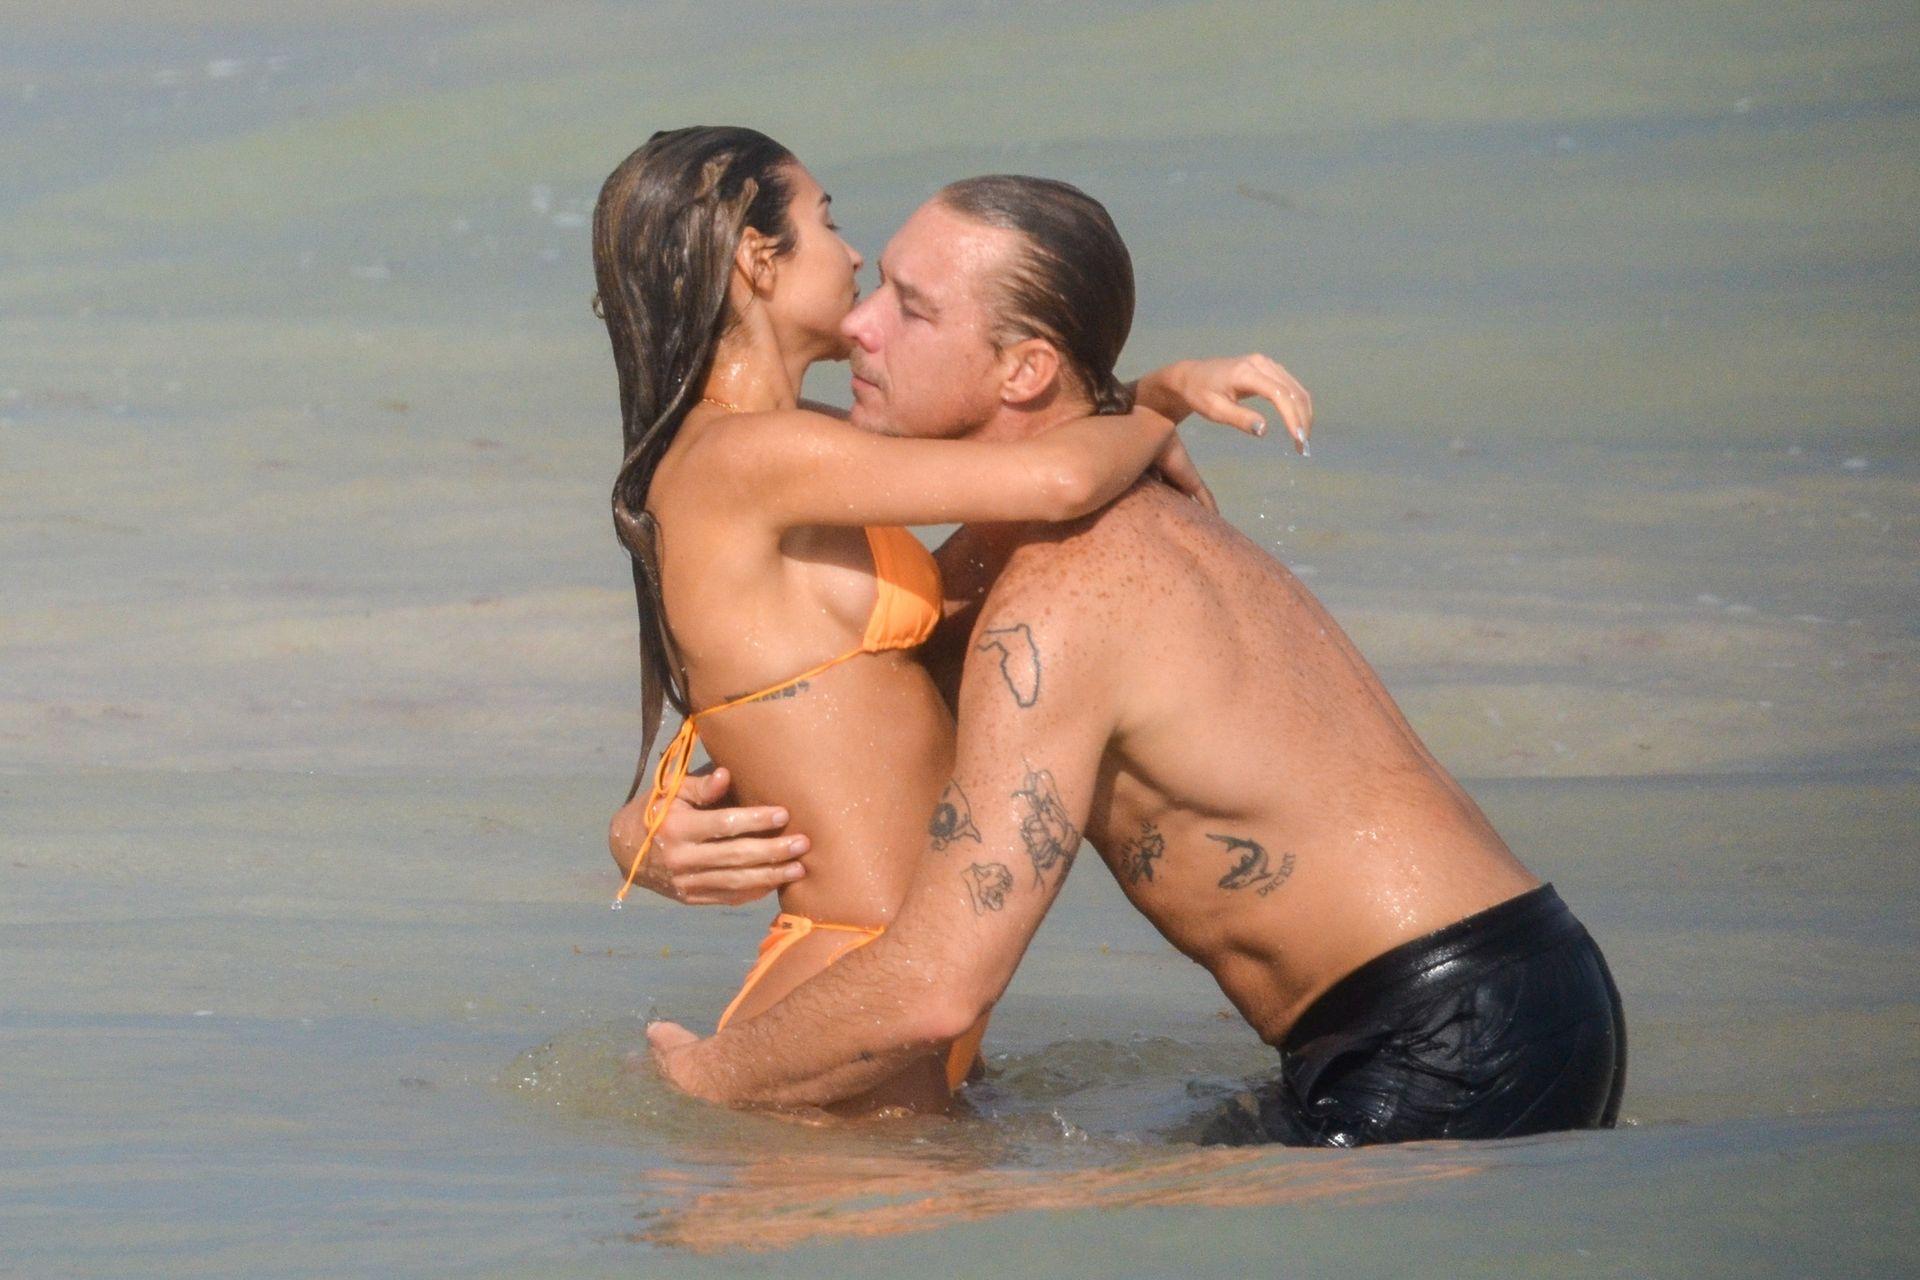 Chantel Jeffries And Dj Diplo Take Their New Love To Mexico 0004